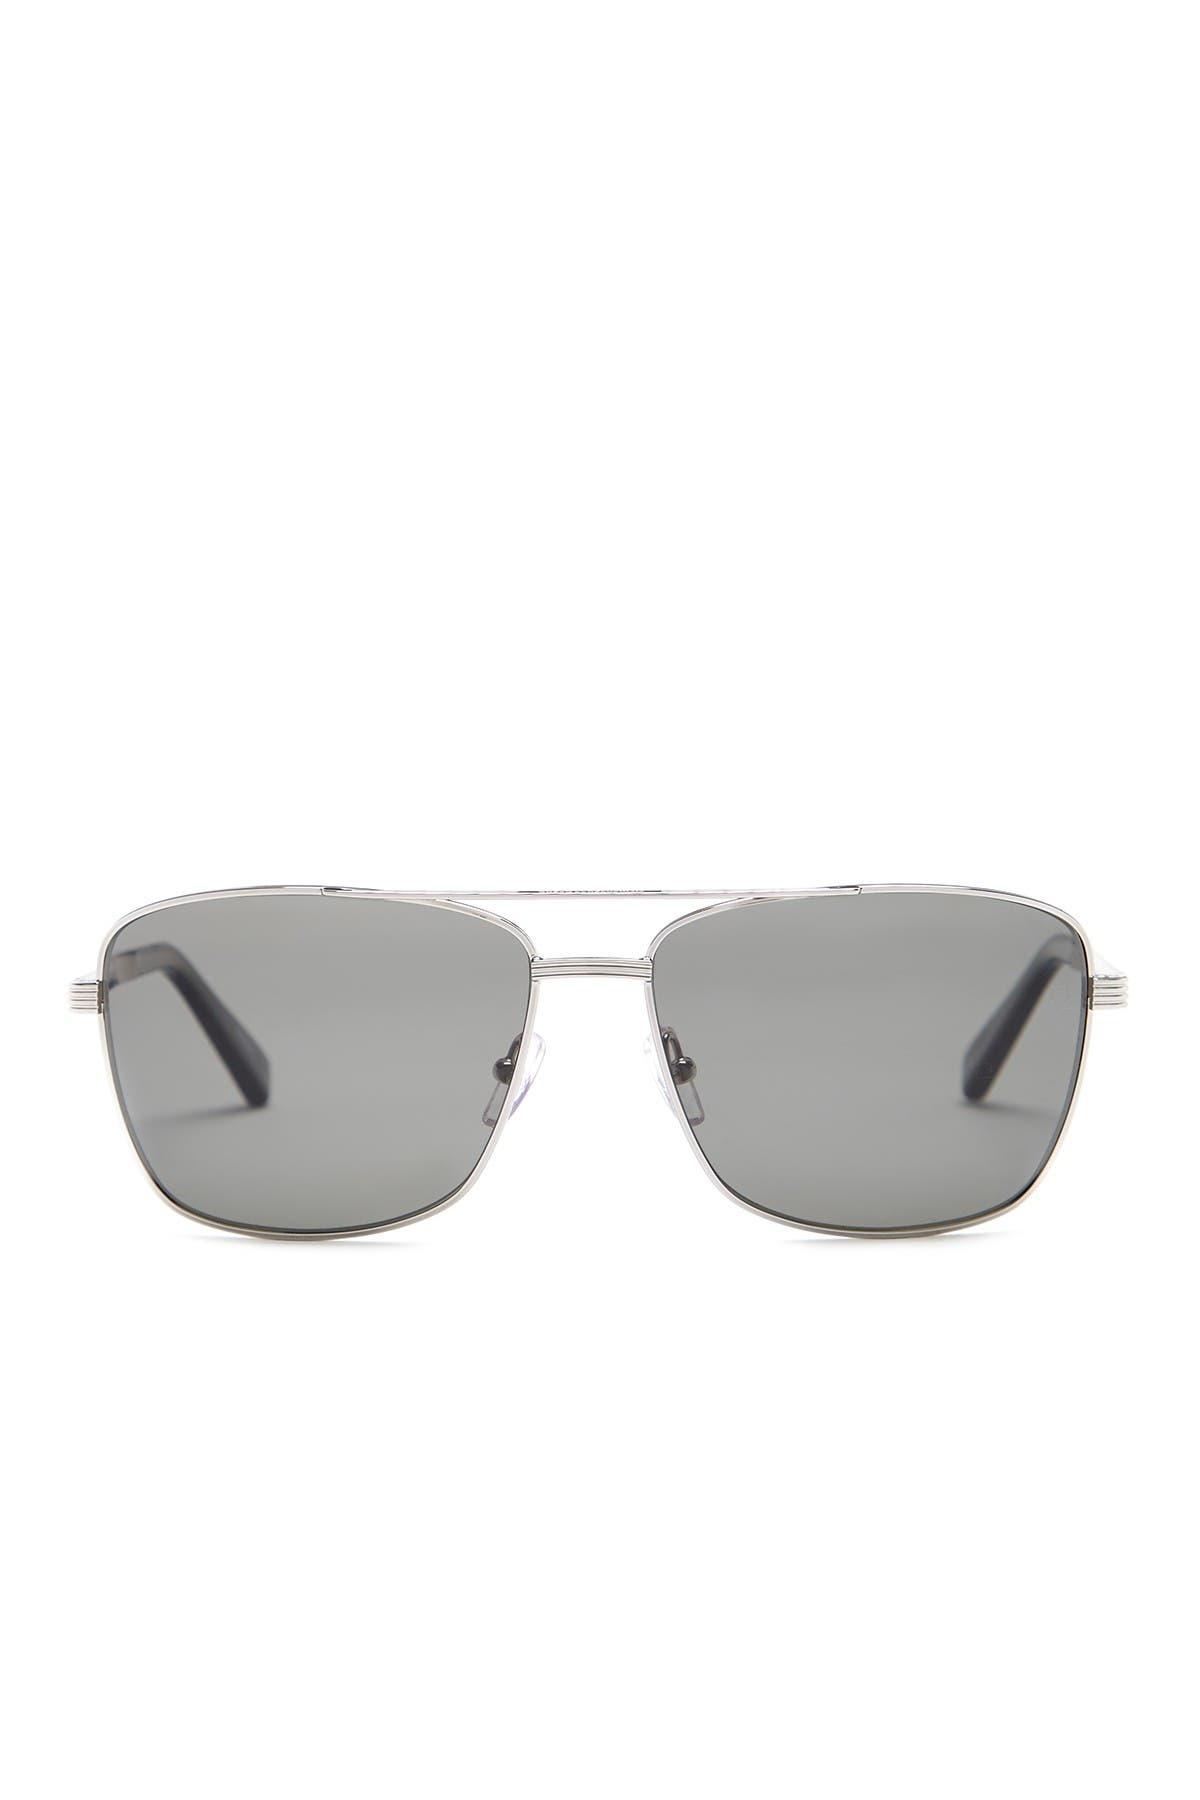 Image of Ermenegildo Zegna 61mm Navigator Sunglasses